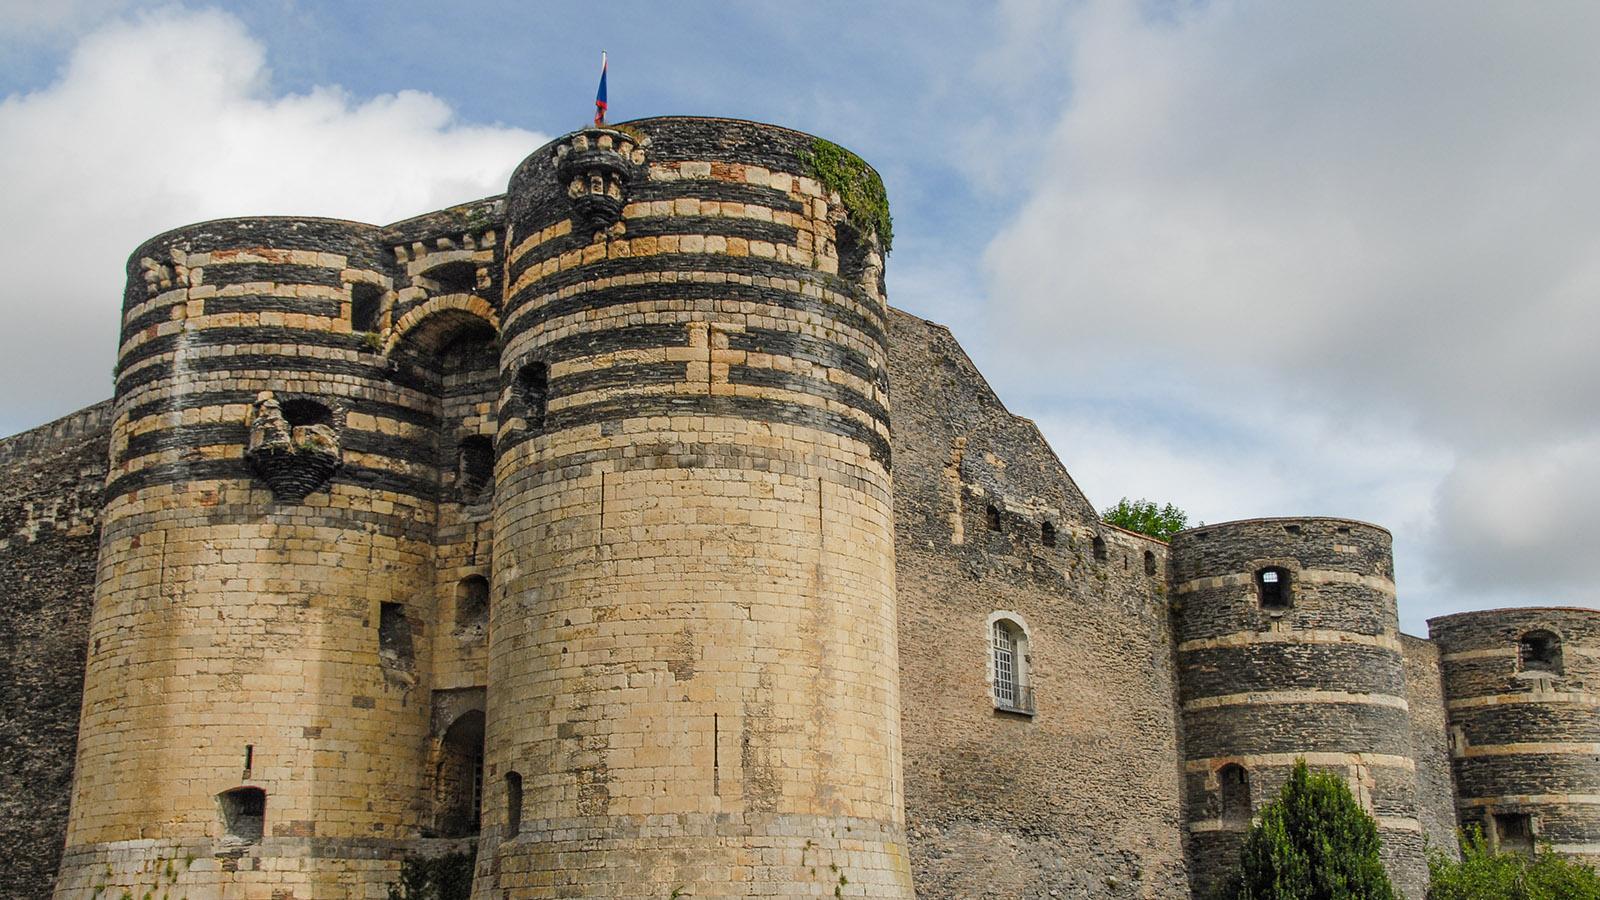 Angers: Die wuchtige Festung des Roi René in Angers. Foto: Hilke Maunder